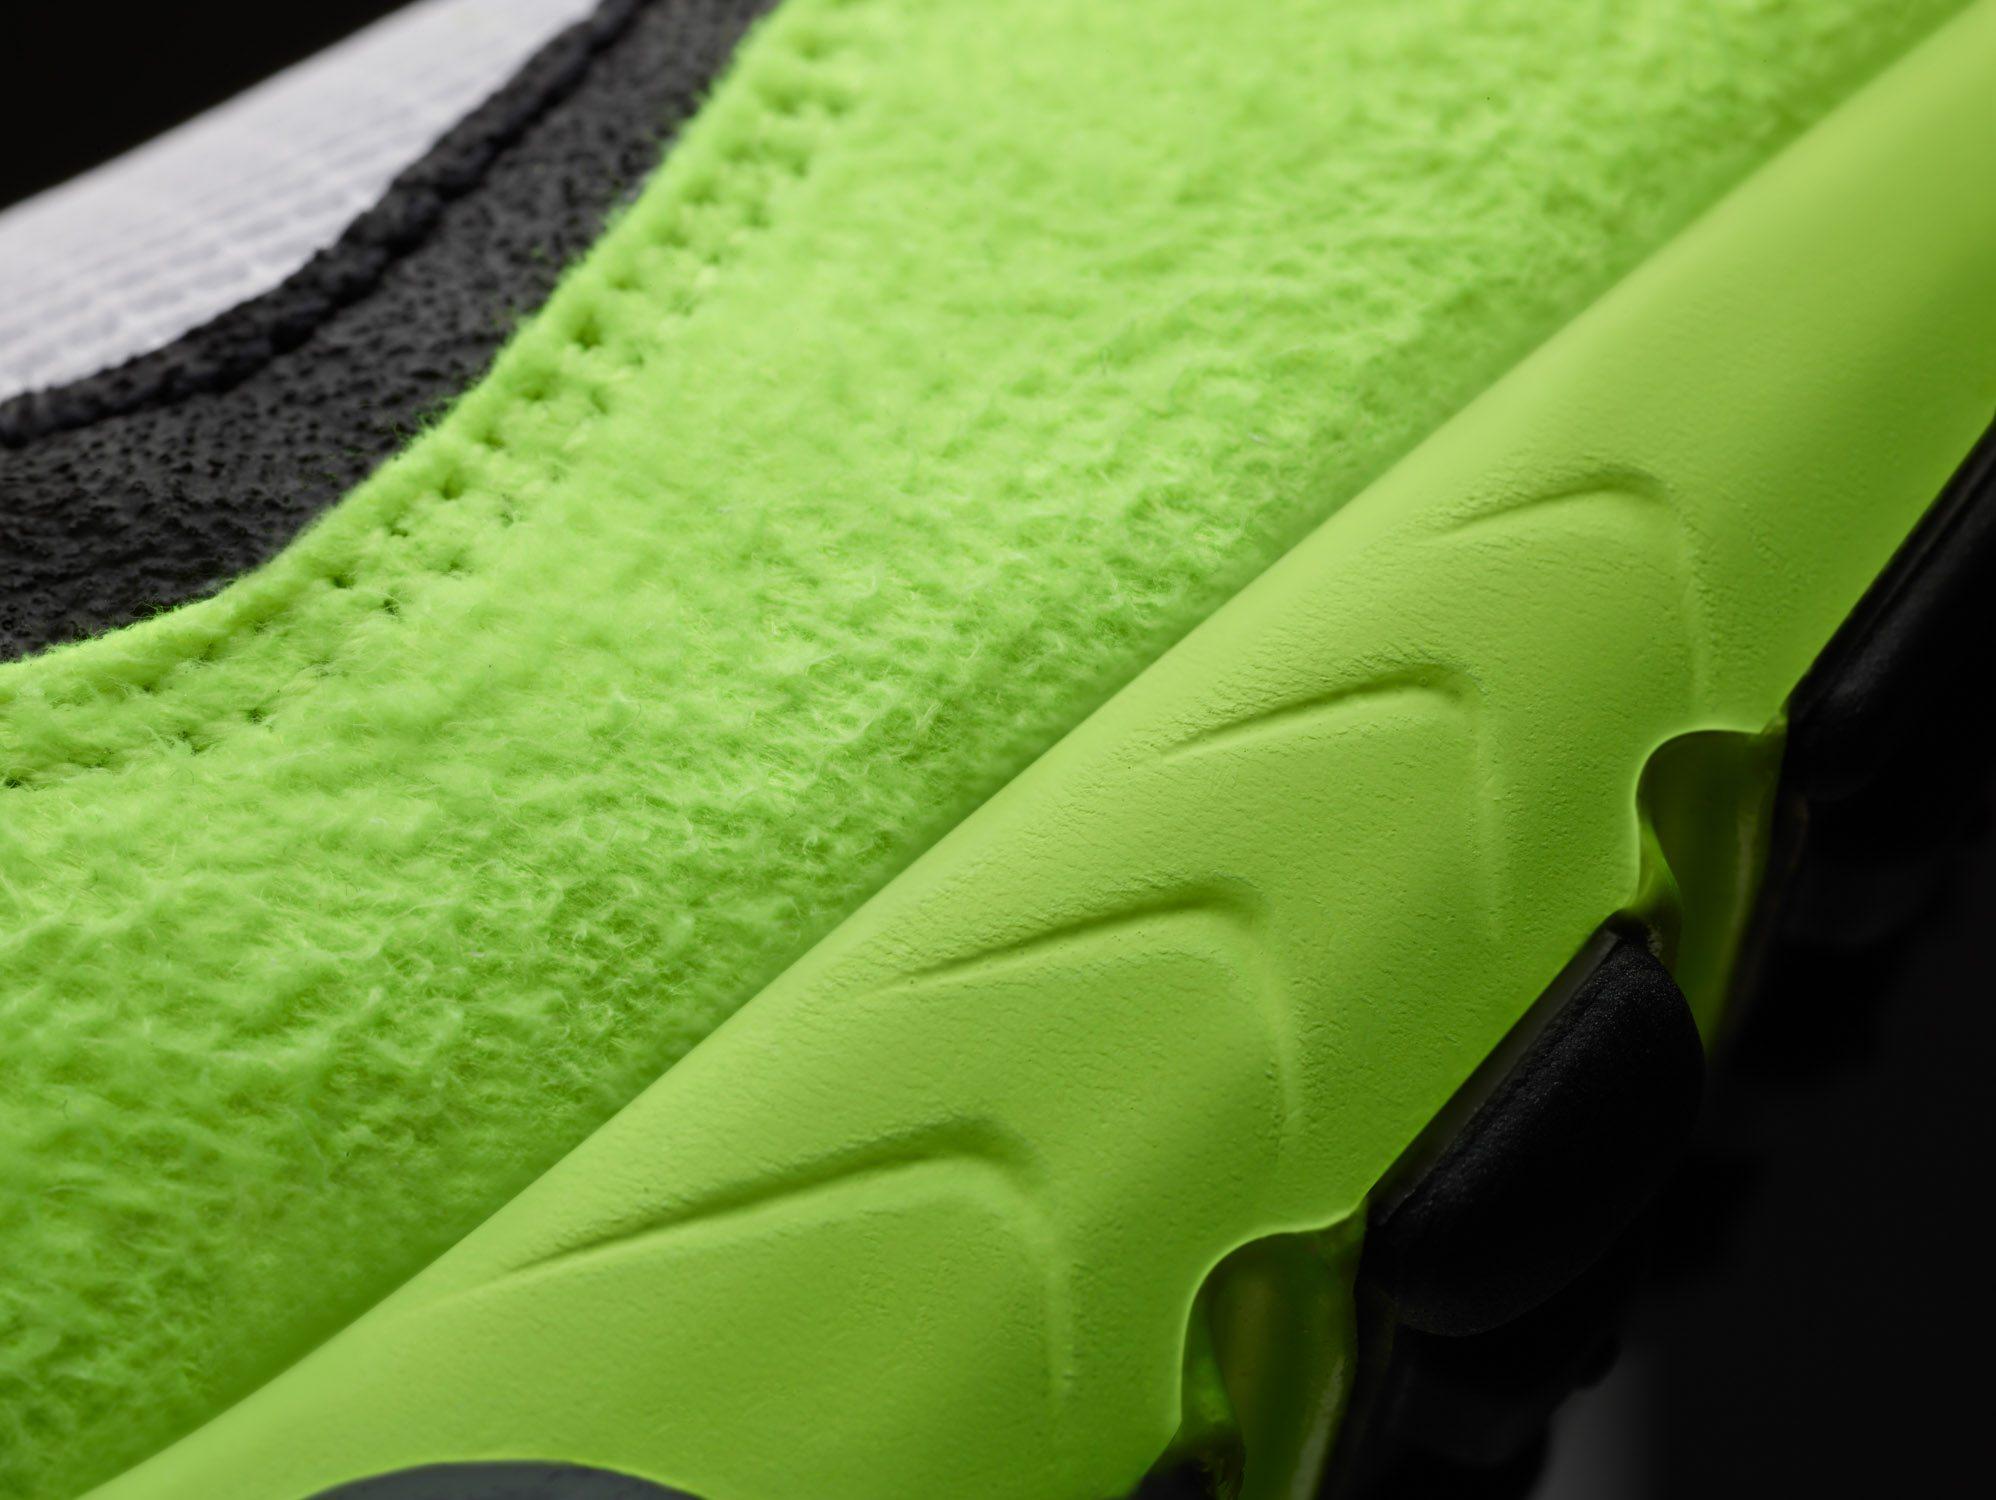 NikeLab Air Zoom Talaria 4